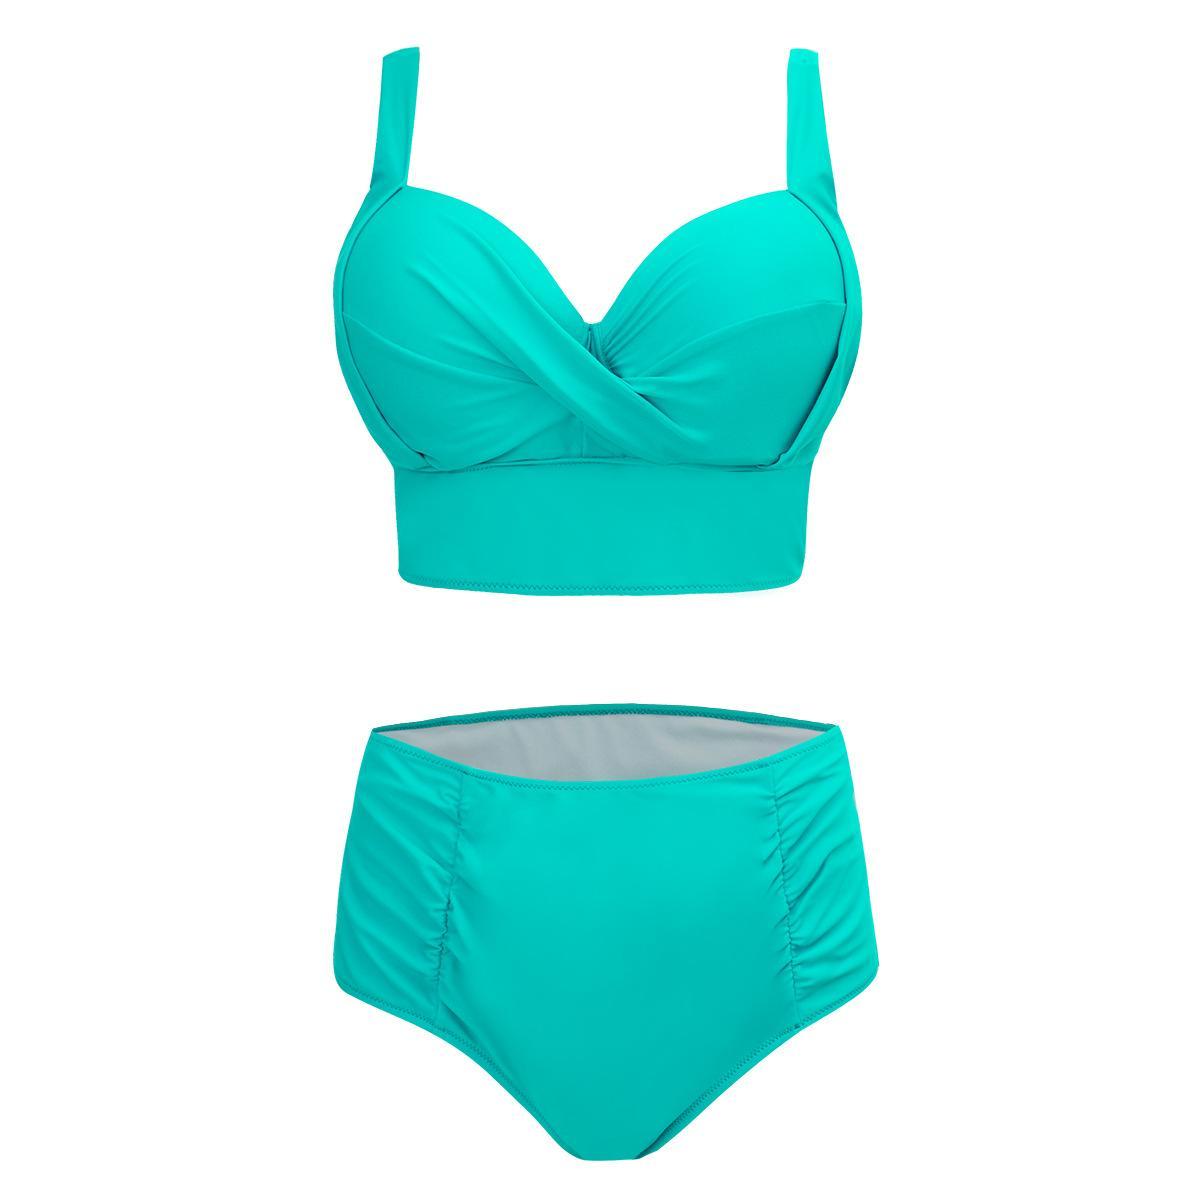 0c47bf6a0901e 2019 Elliehouse Sexy High Waist Bikini Set Swimwear Women Swimsuit Push Up  Womens Bikini Halter Top Bathing Suit Beachwear Plus Size 5xL From  Elliehouse, ...